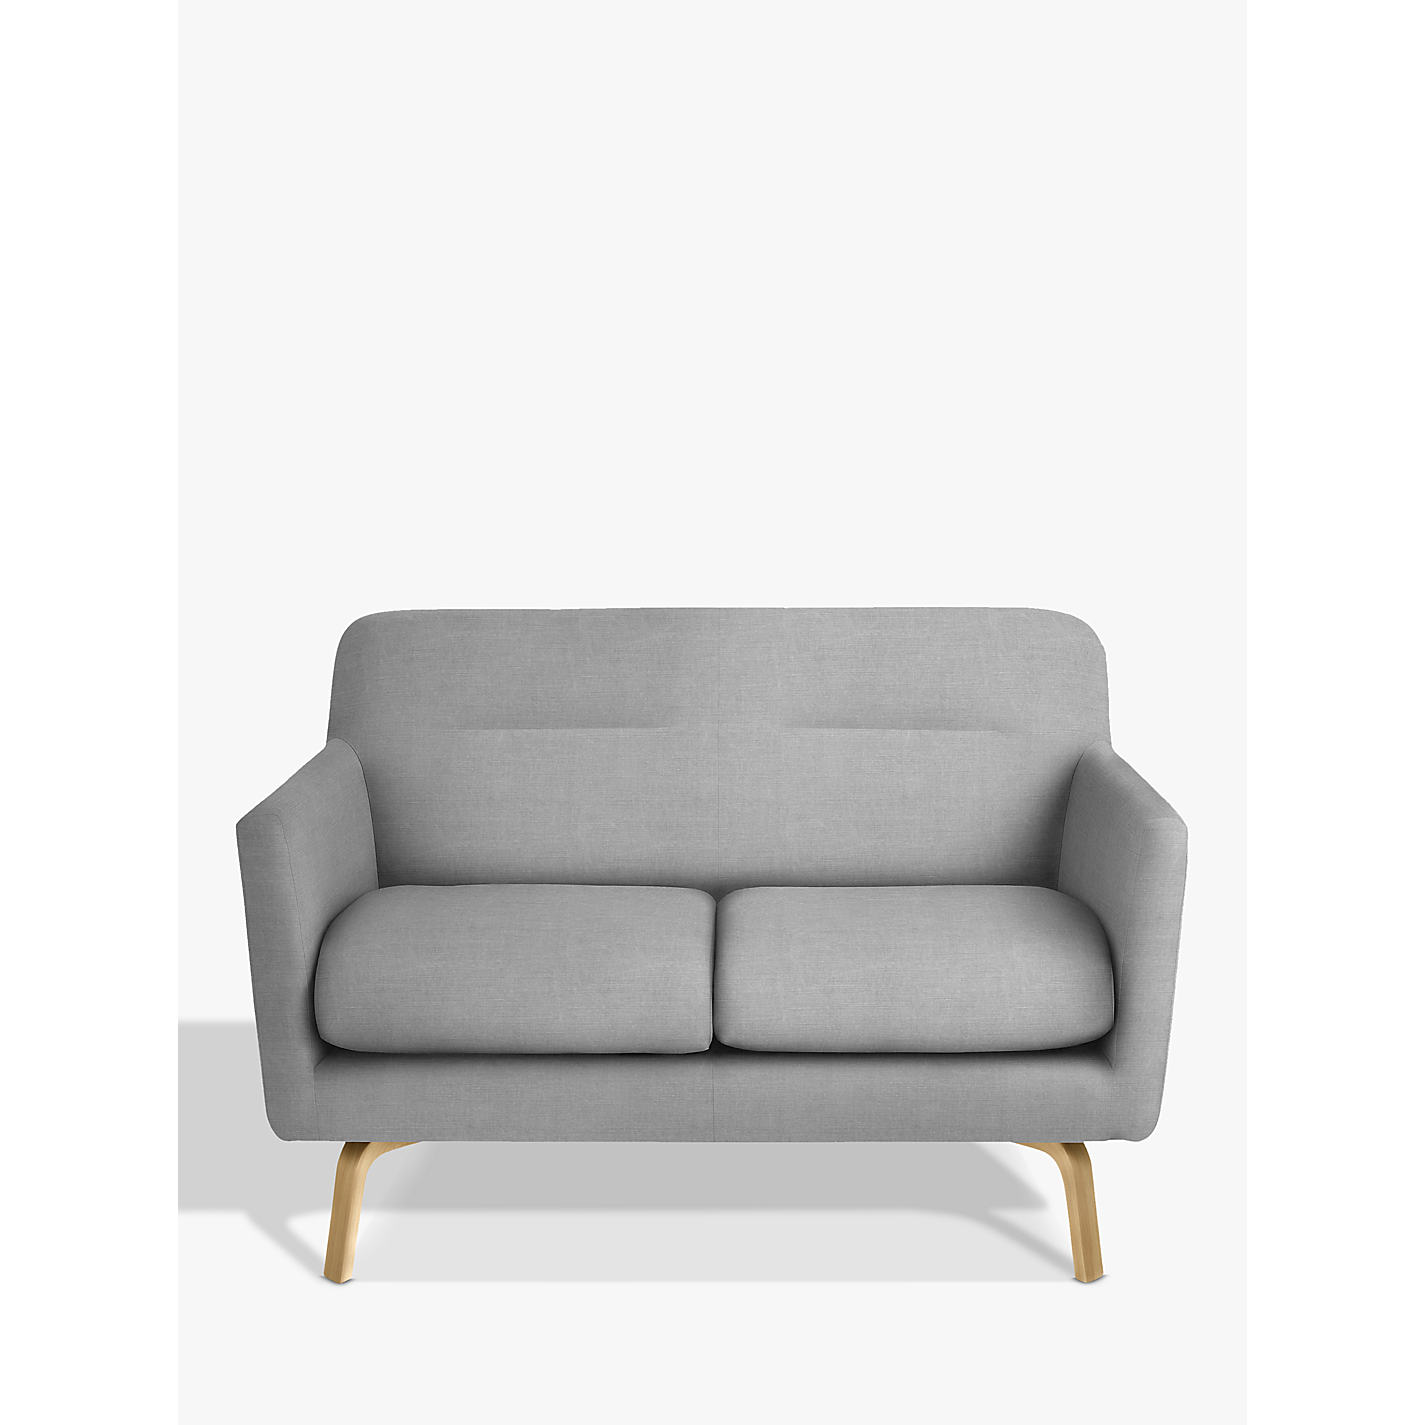 2 Seater Small Sofa